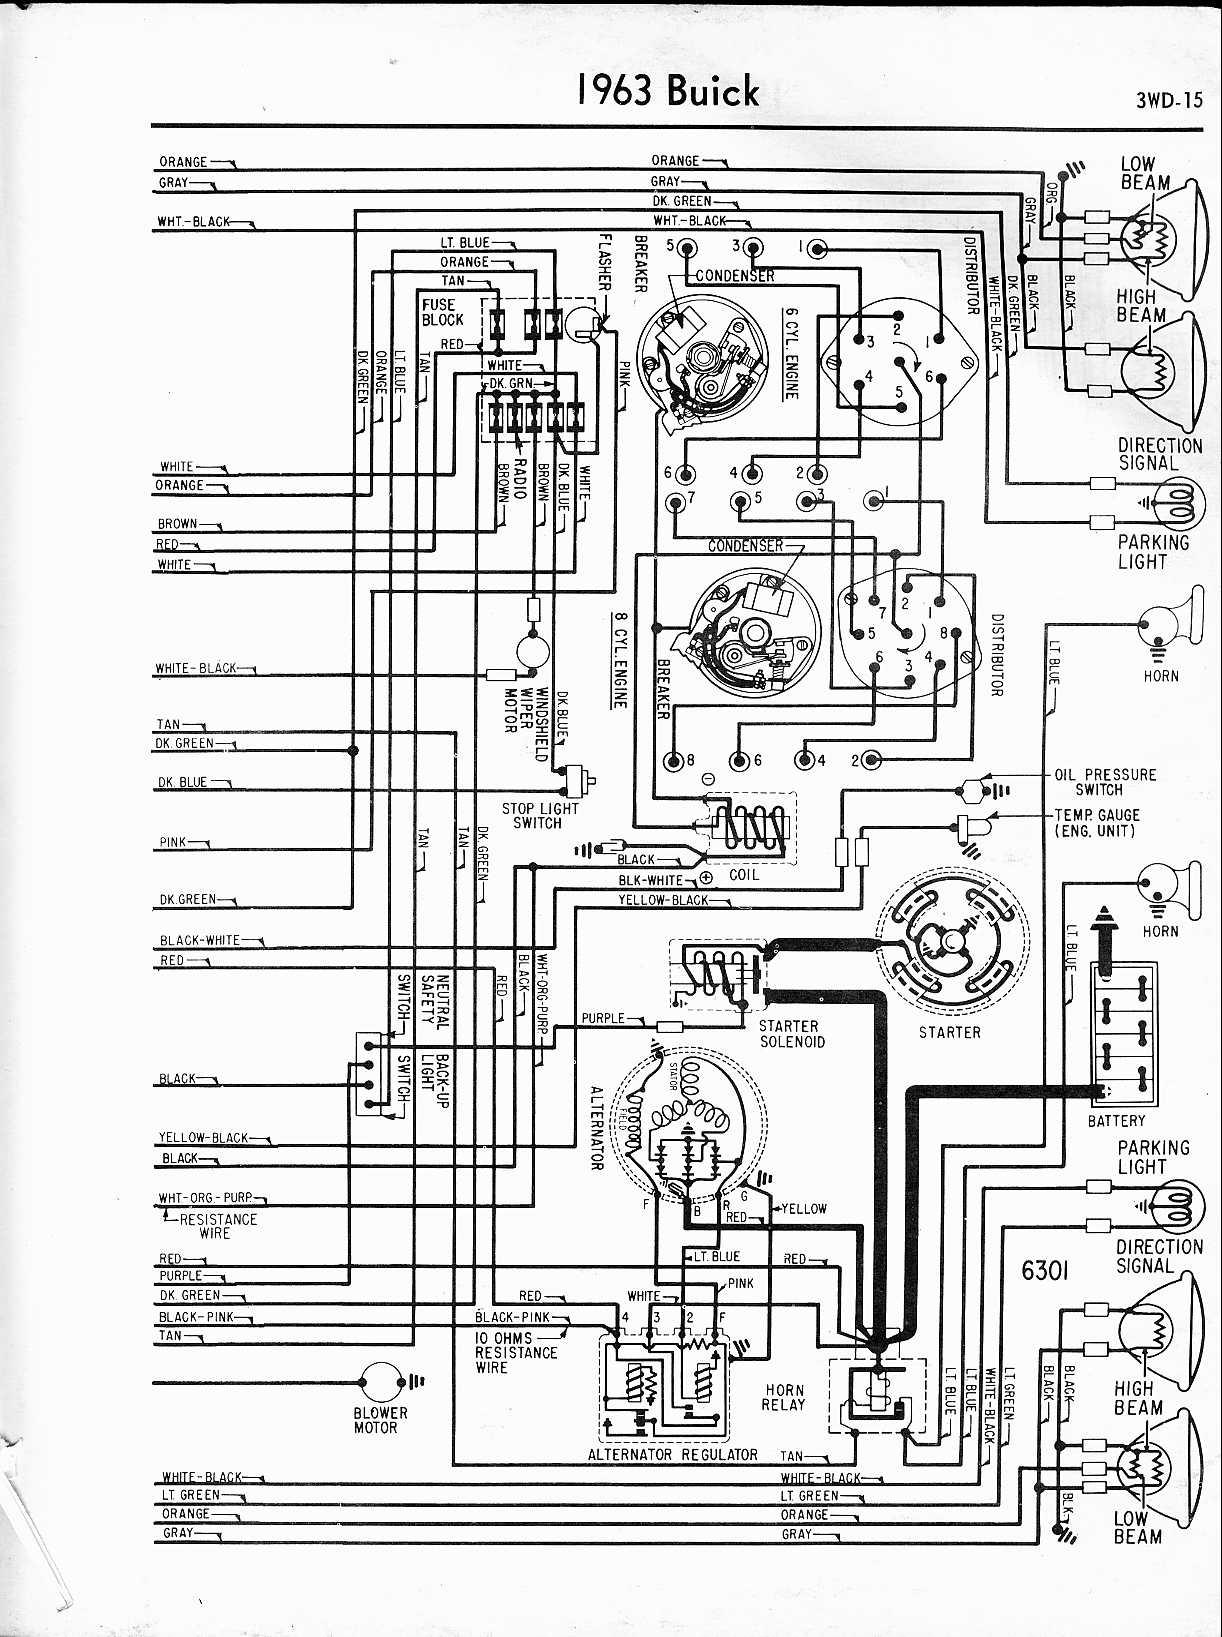 Strange 1939 Buick Vacuum Diagram Basic Electronics Wiring Diagram Wiring Cloud Timewinrebemohammedshrineorg